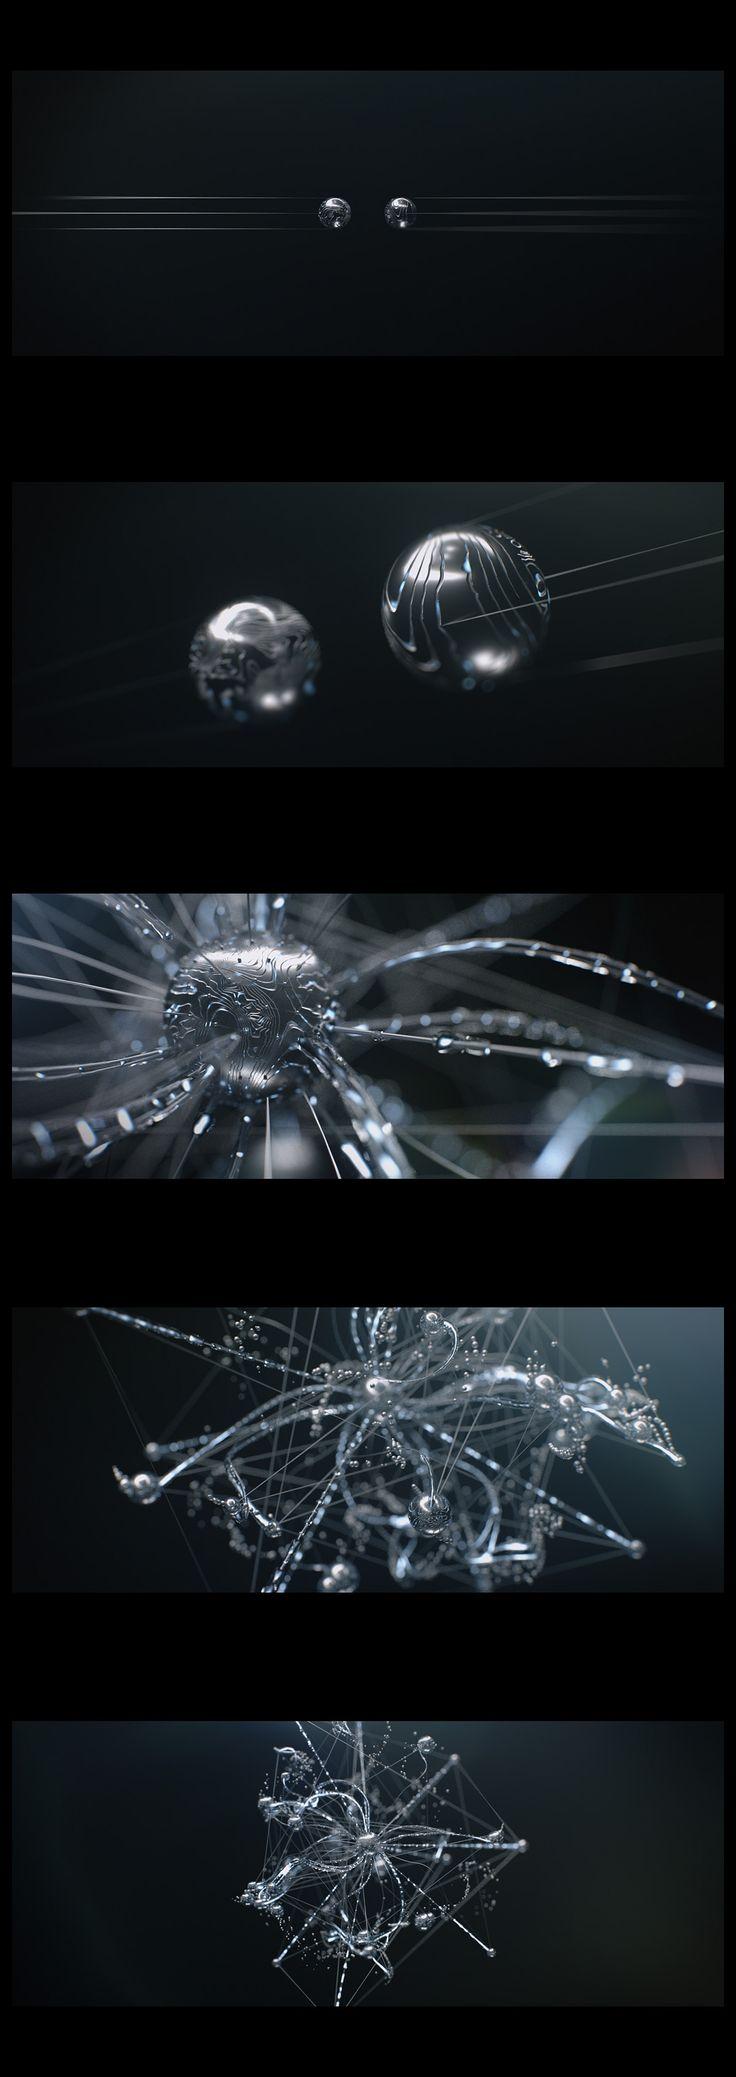 https://www.behance.net/gallery/44559033/Startup-Collider-Concept-Design